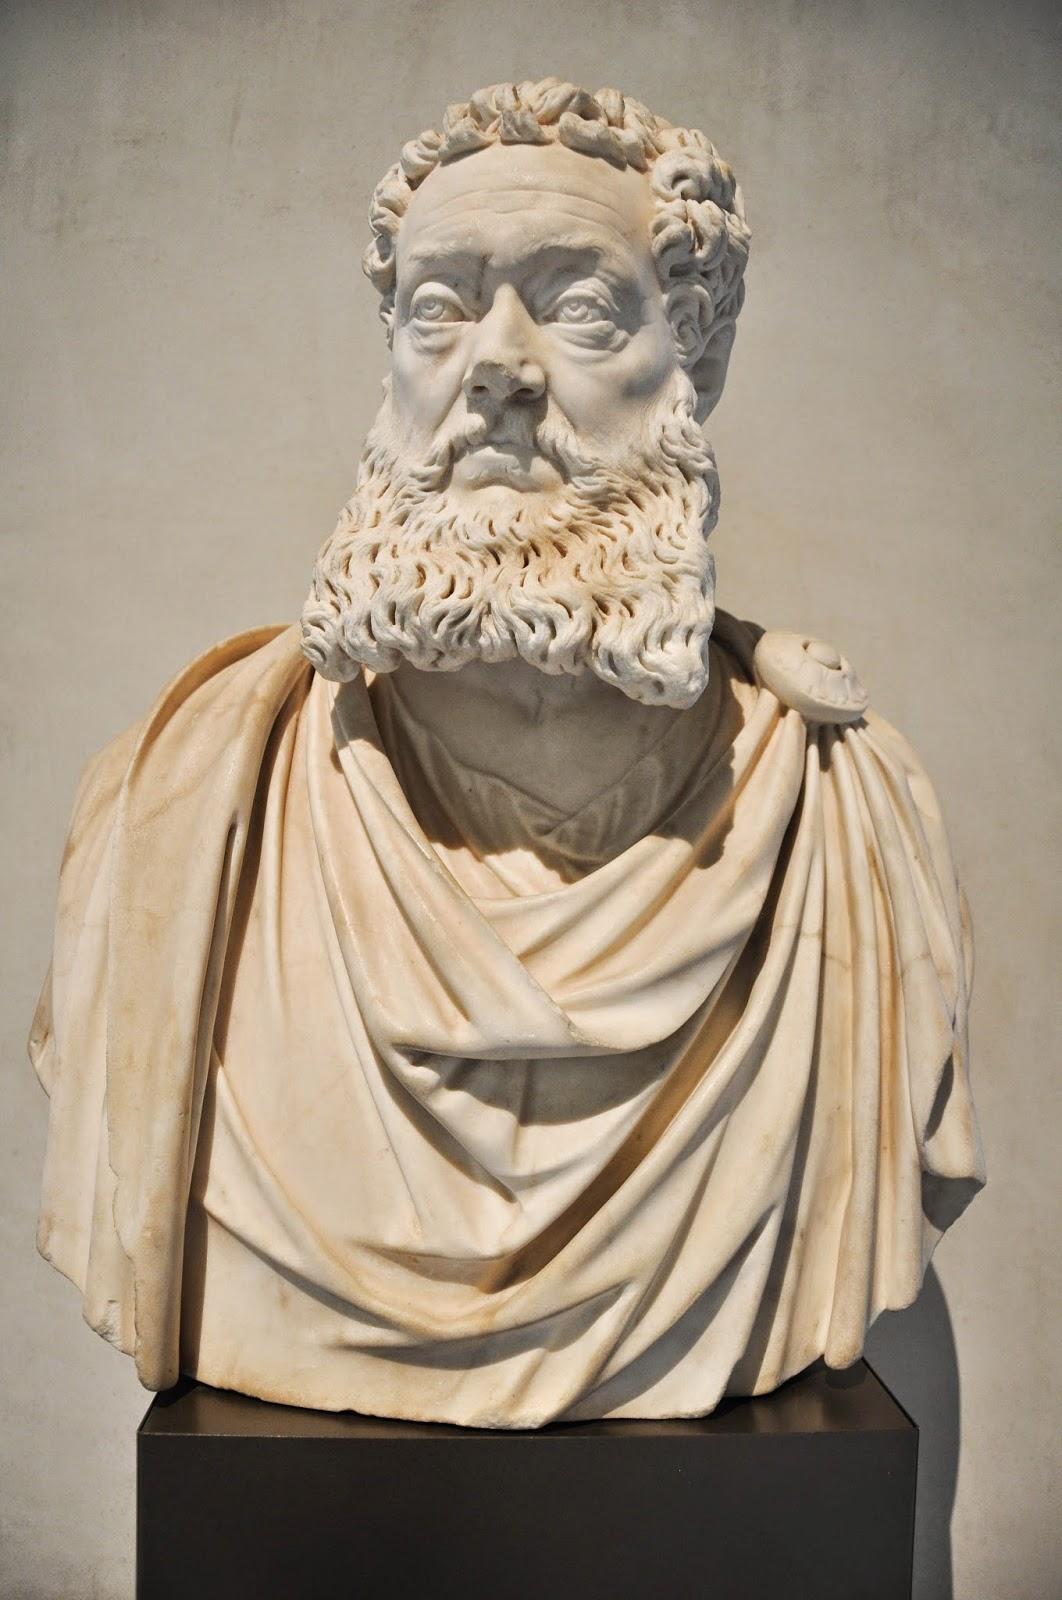 marble bust Vincenzo Pellegrini Alessandro Vittoria Civic Art Gallery Palazzo Chiericati Vicenza Italy